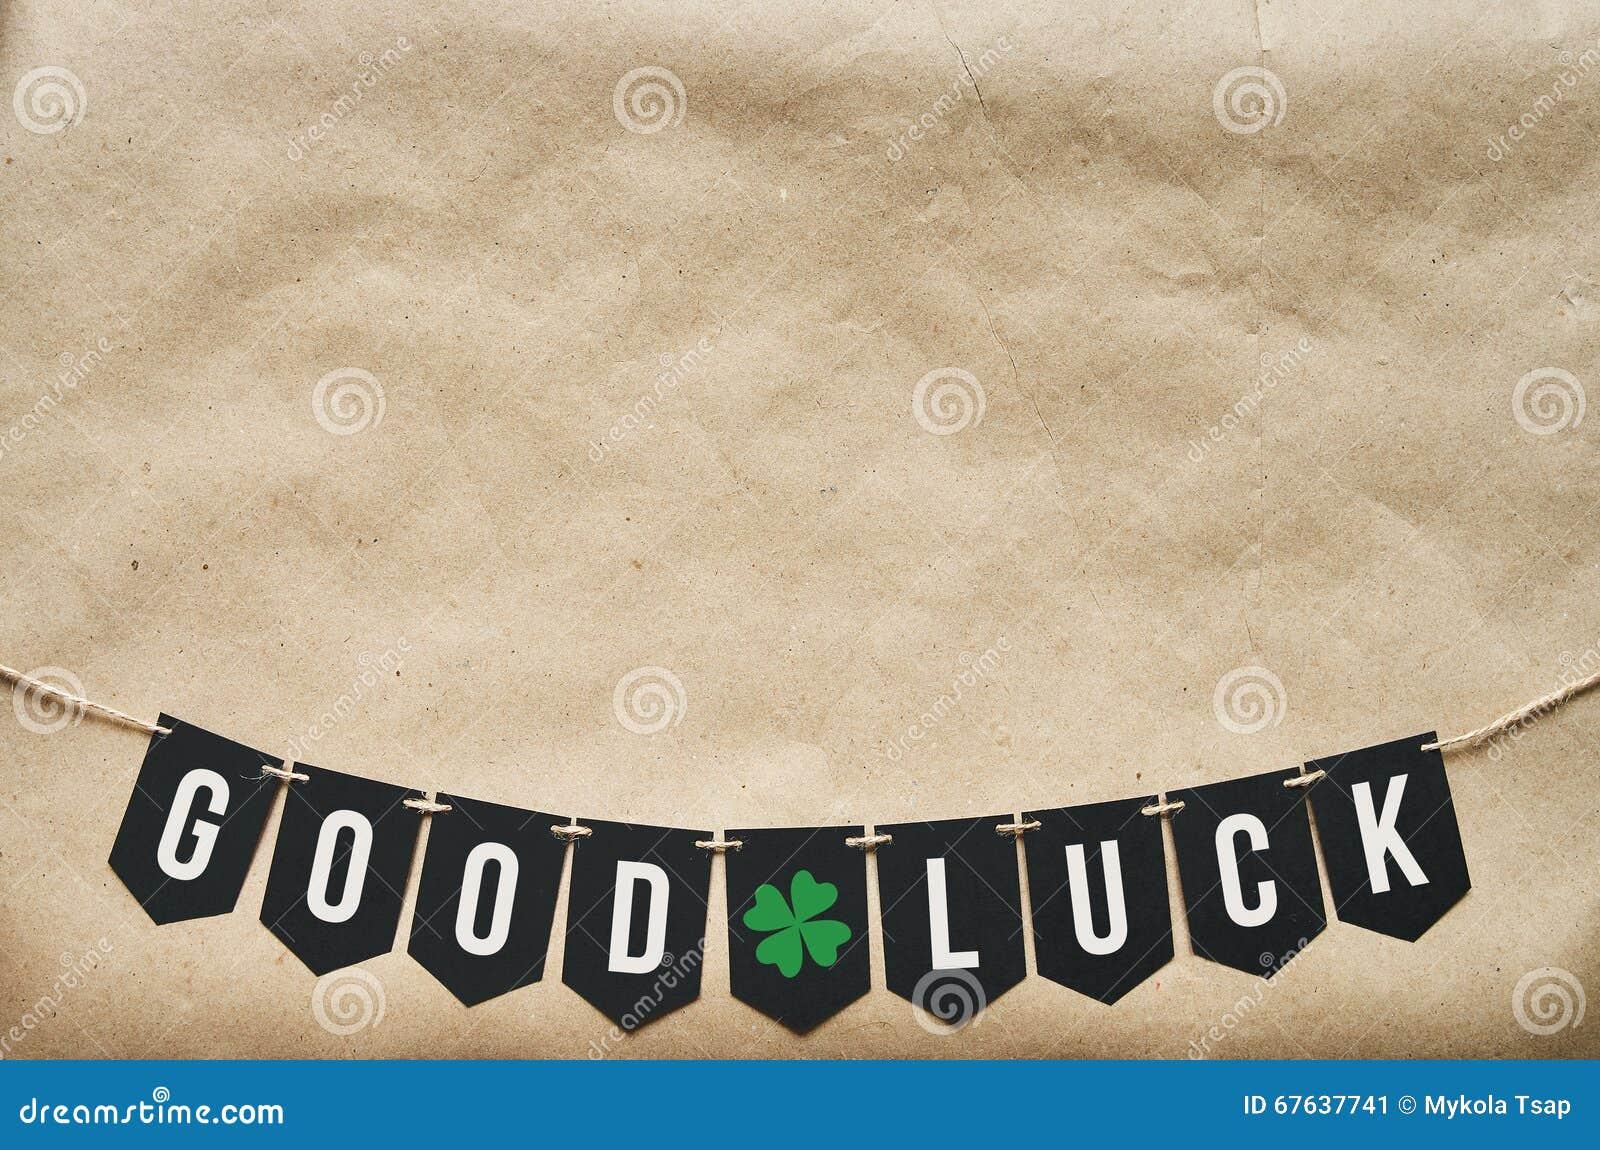 GOOD LUCK Banner Lettering Stock Photo - Image: 67637741